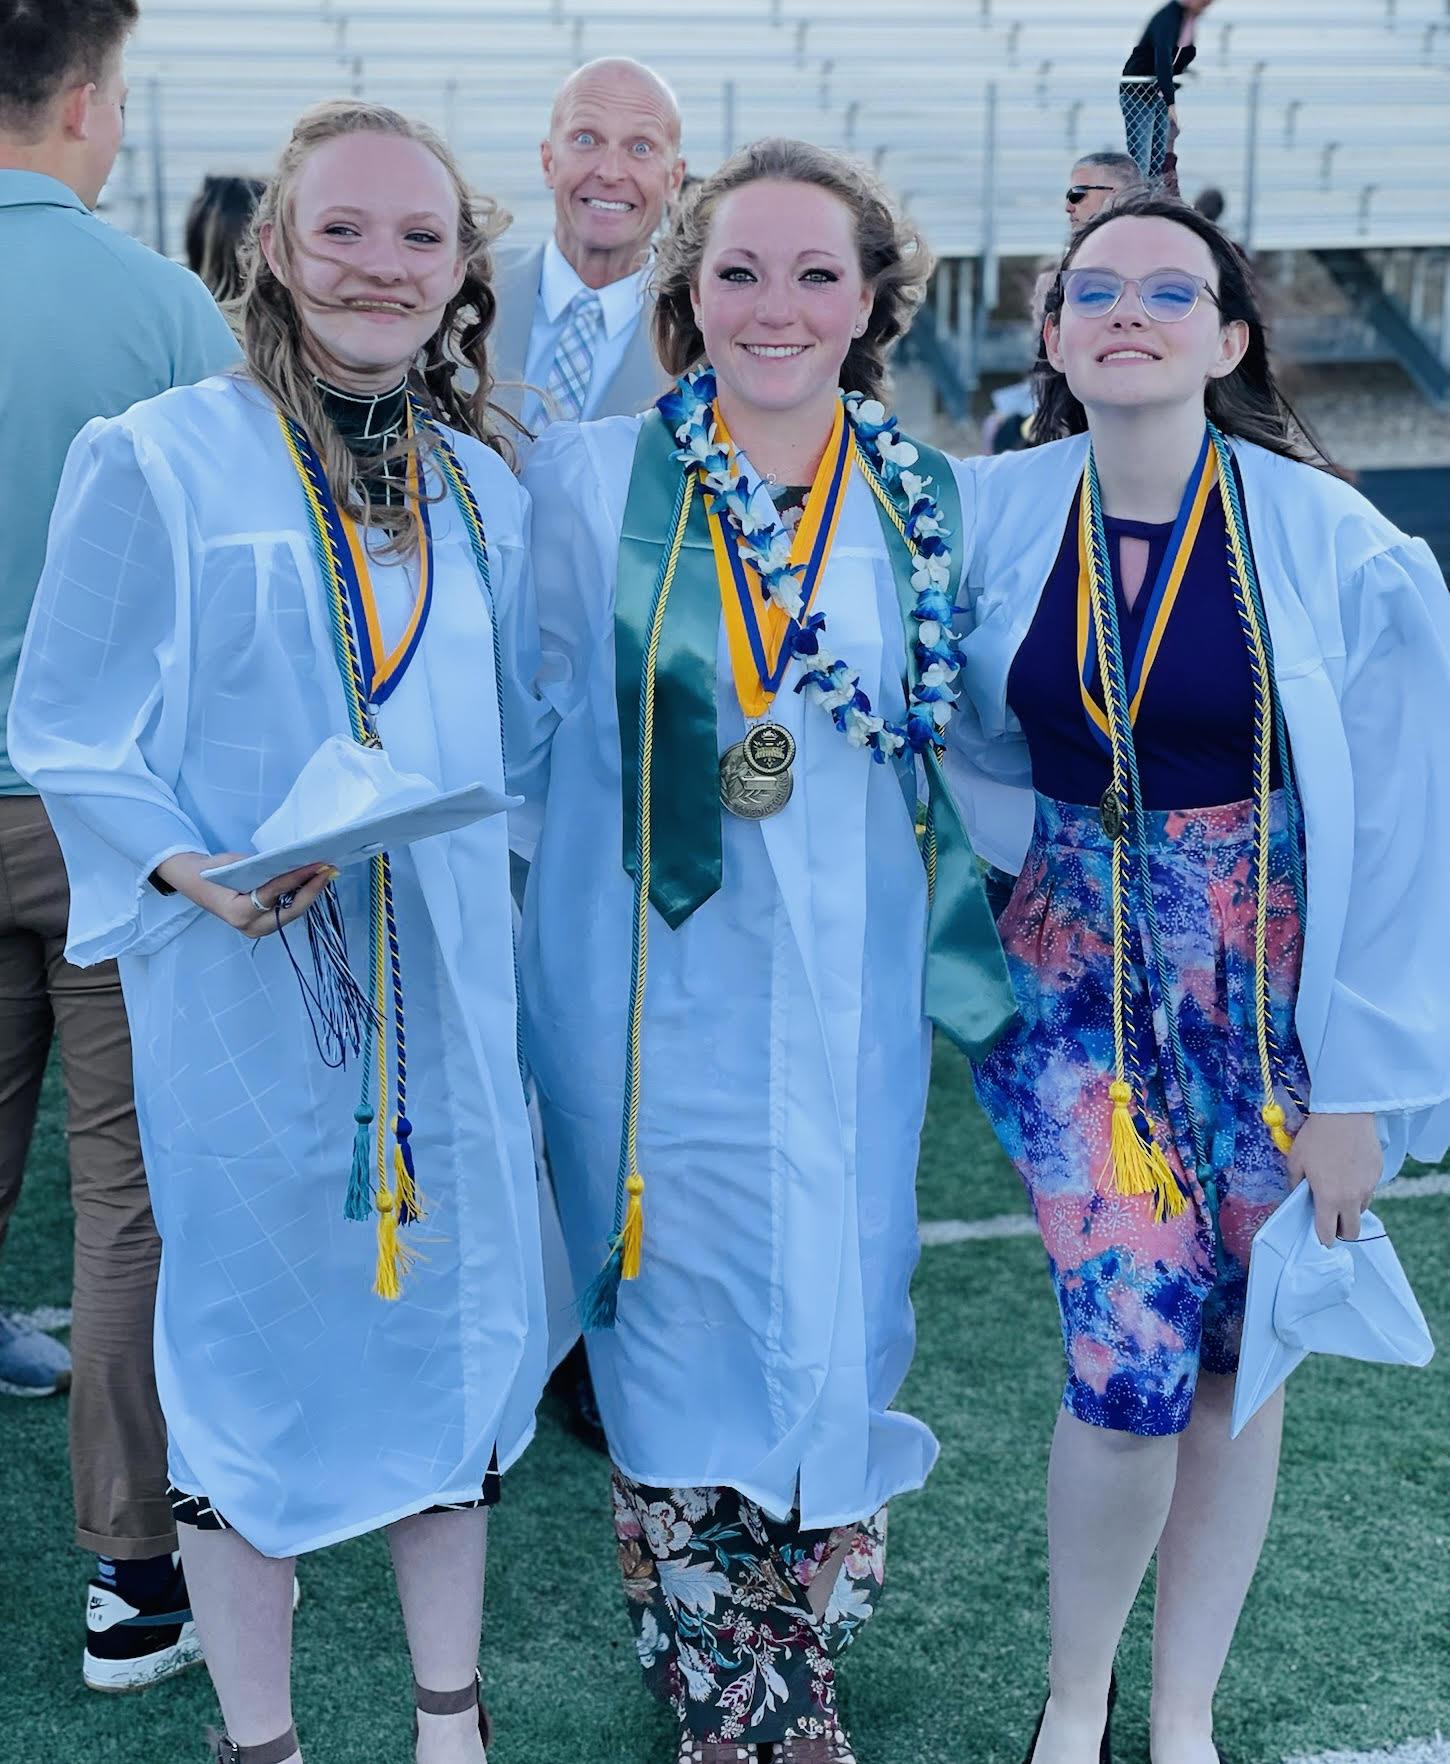 Photobomb at graduation